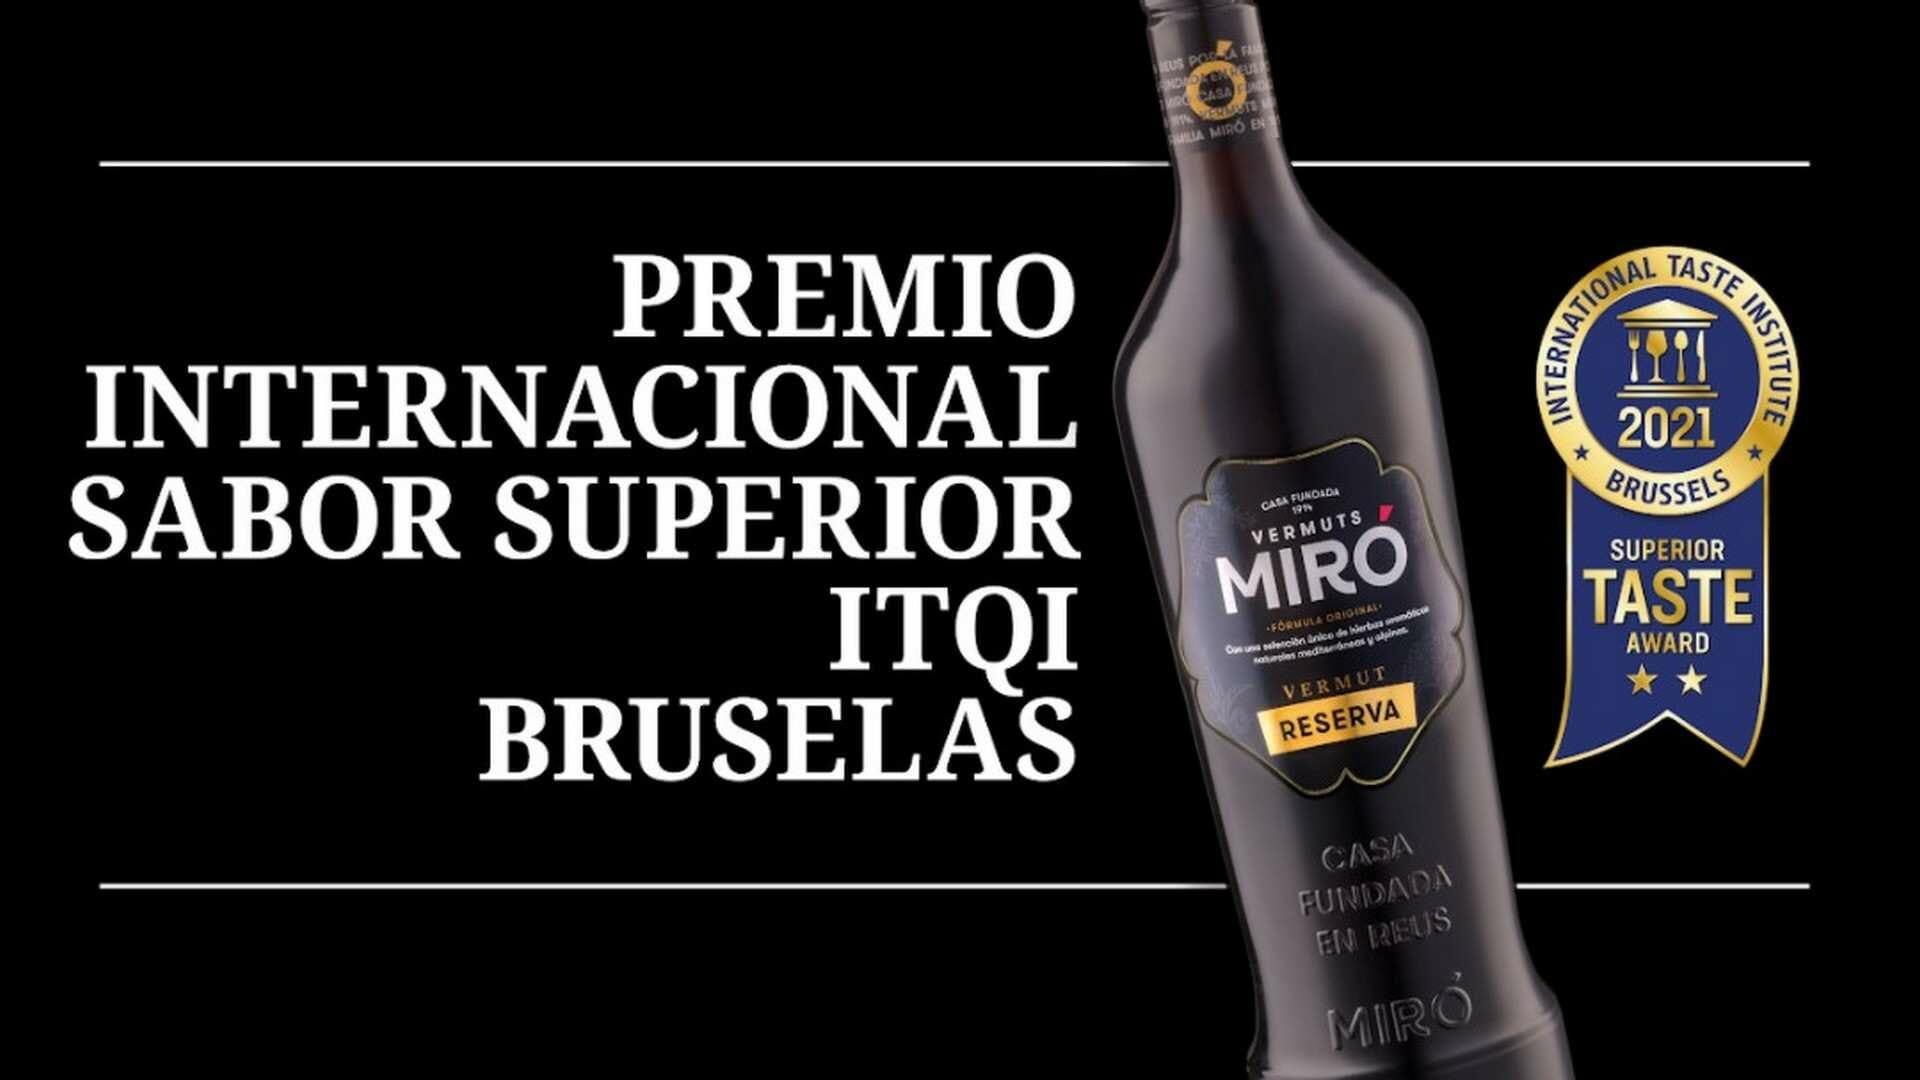 Vermut Miró Reserva, ganador del Premio al Sabor Superior 2021 del International Taste & Quality Institute